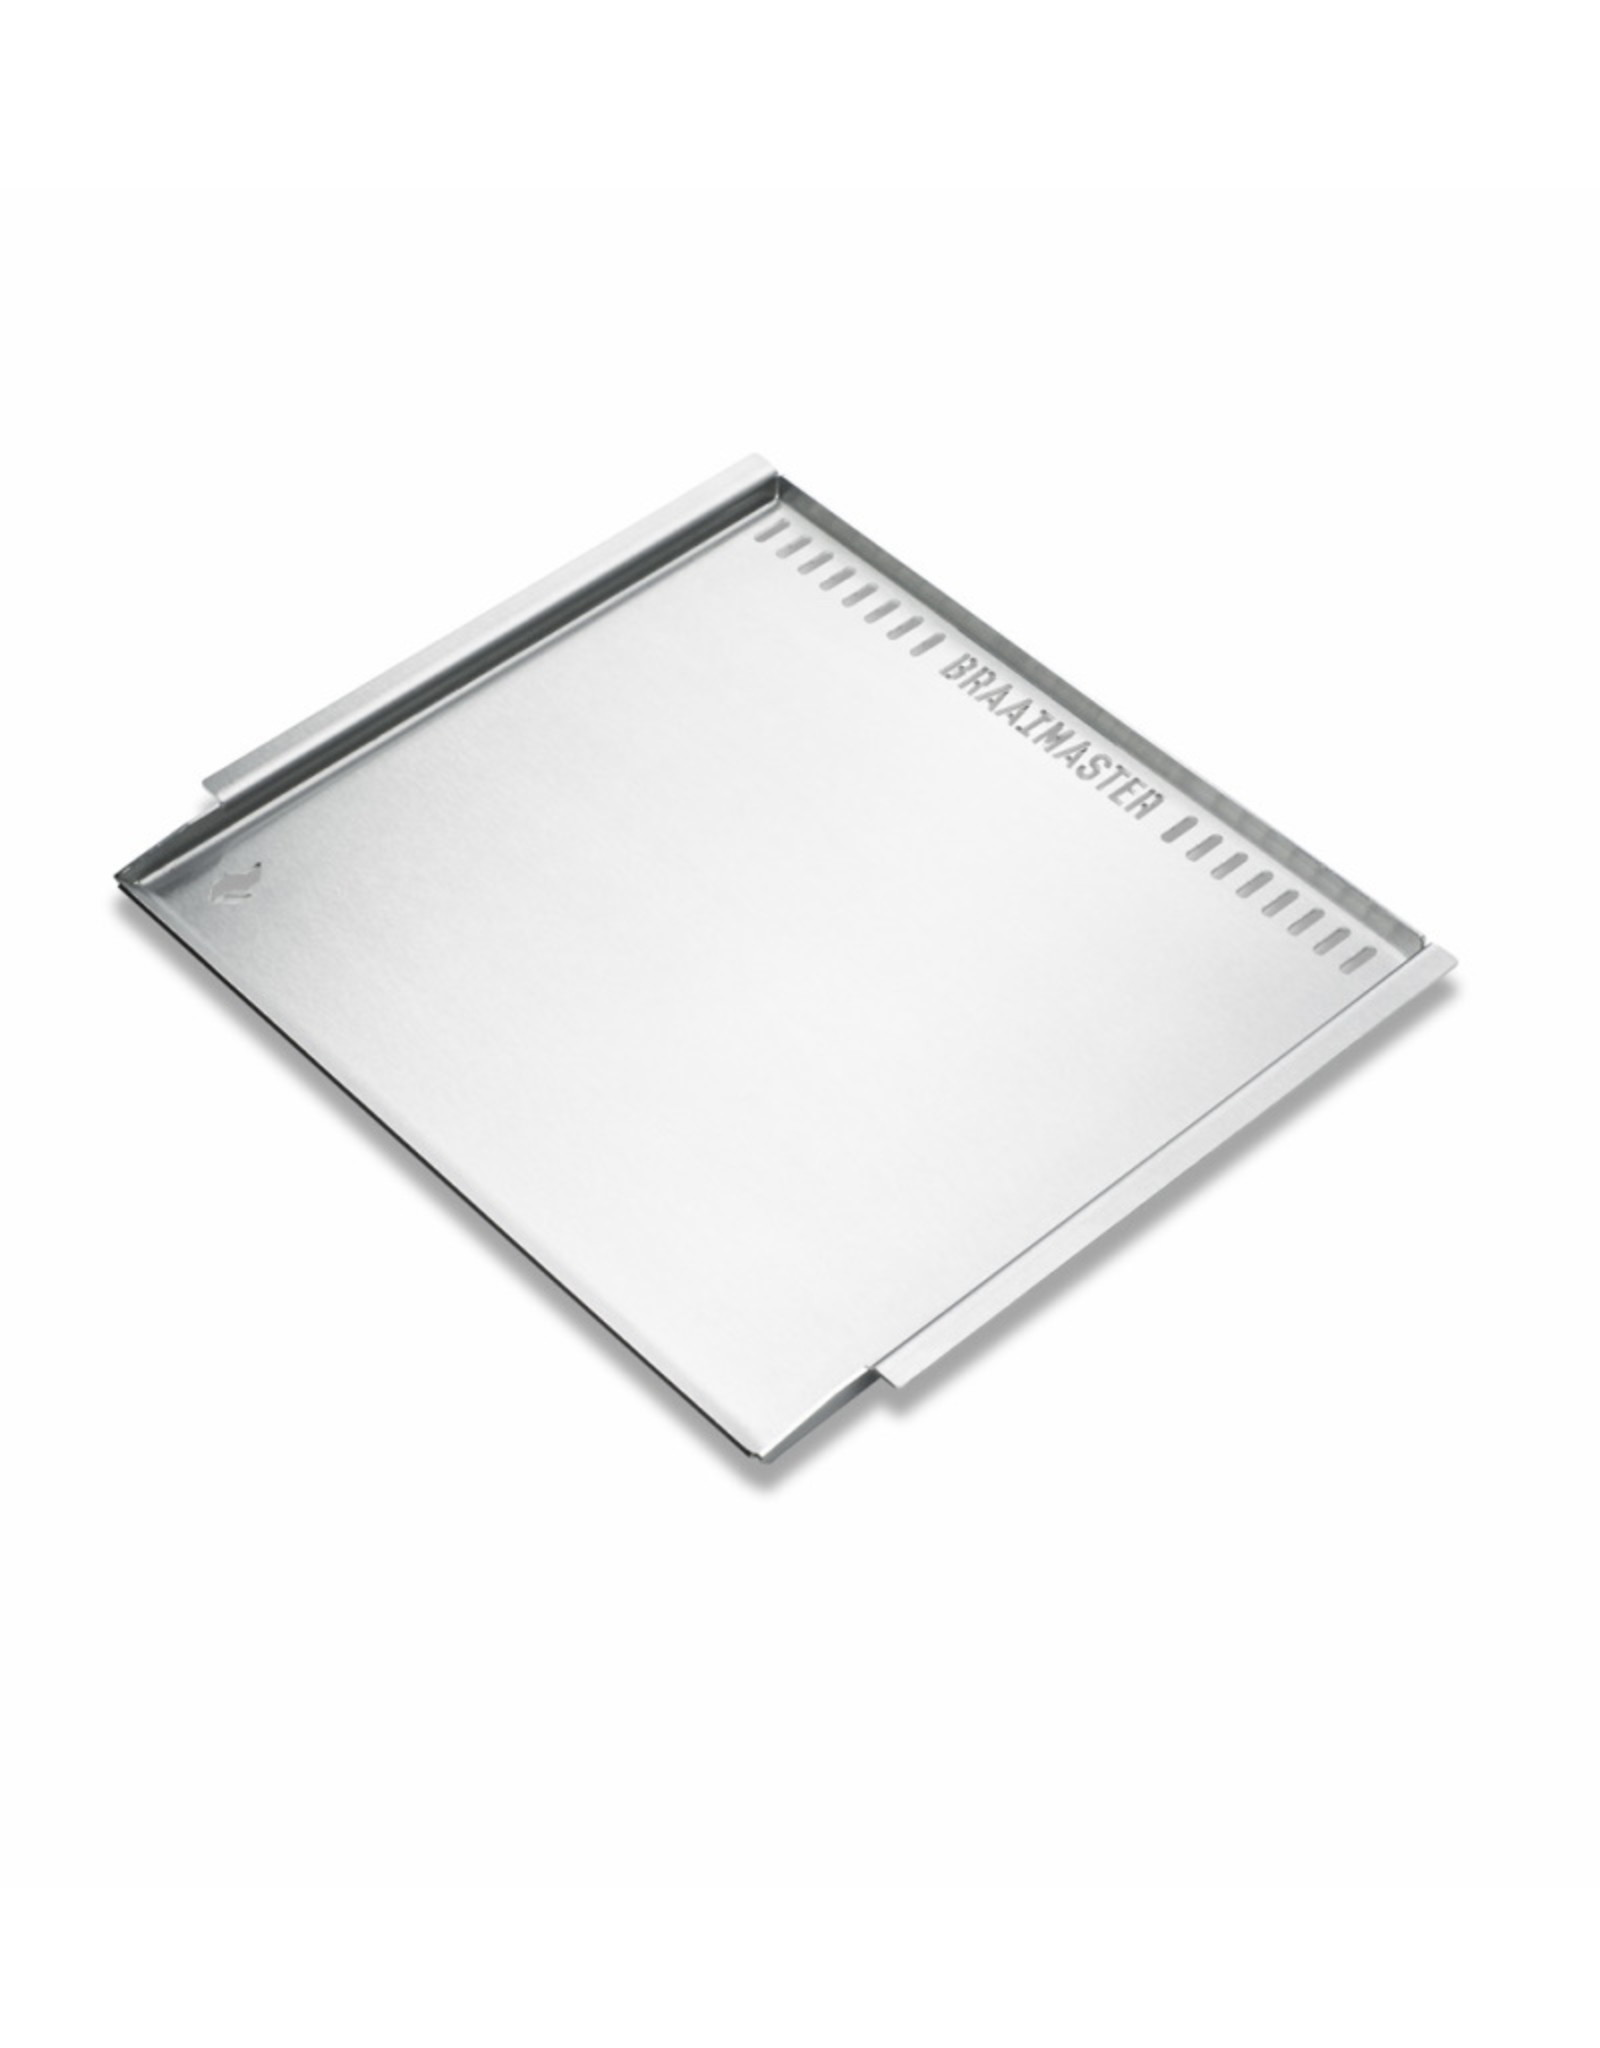 Braaimaster Stainless Steel Plancha